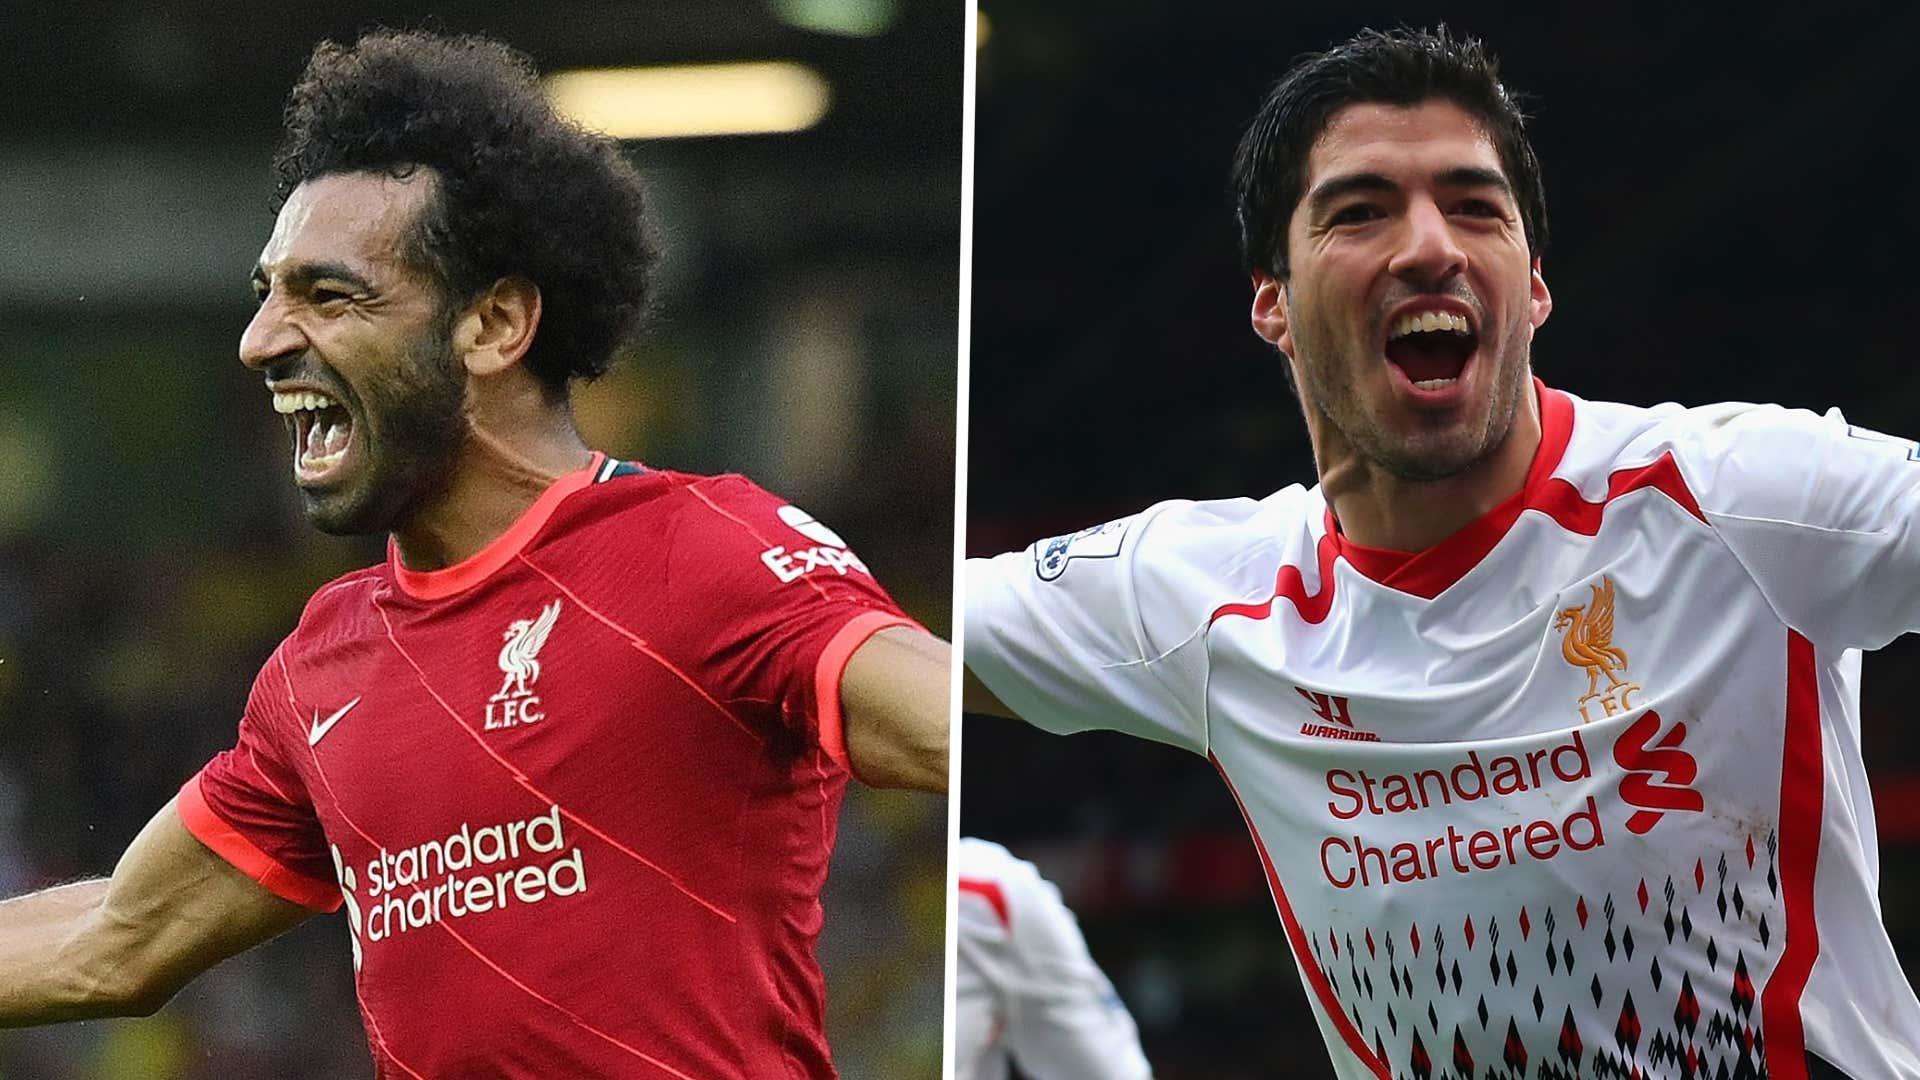 Prime Salah or Prime Suarez? Only one winner as Liverpool legends prepare for Champions League showdown | Goal.com